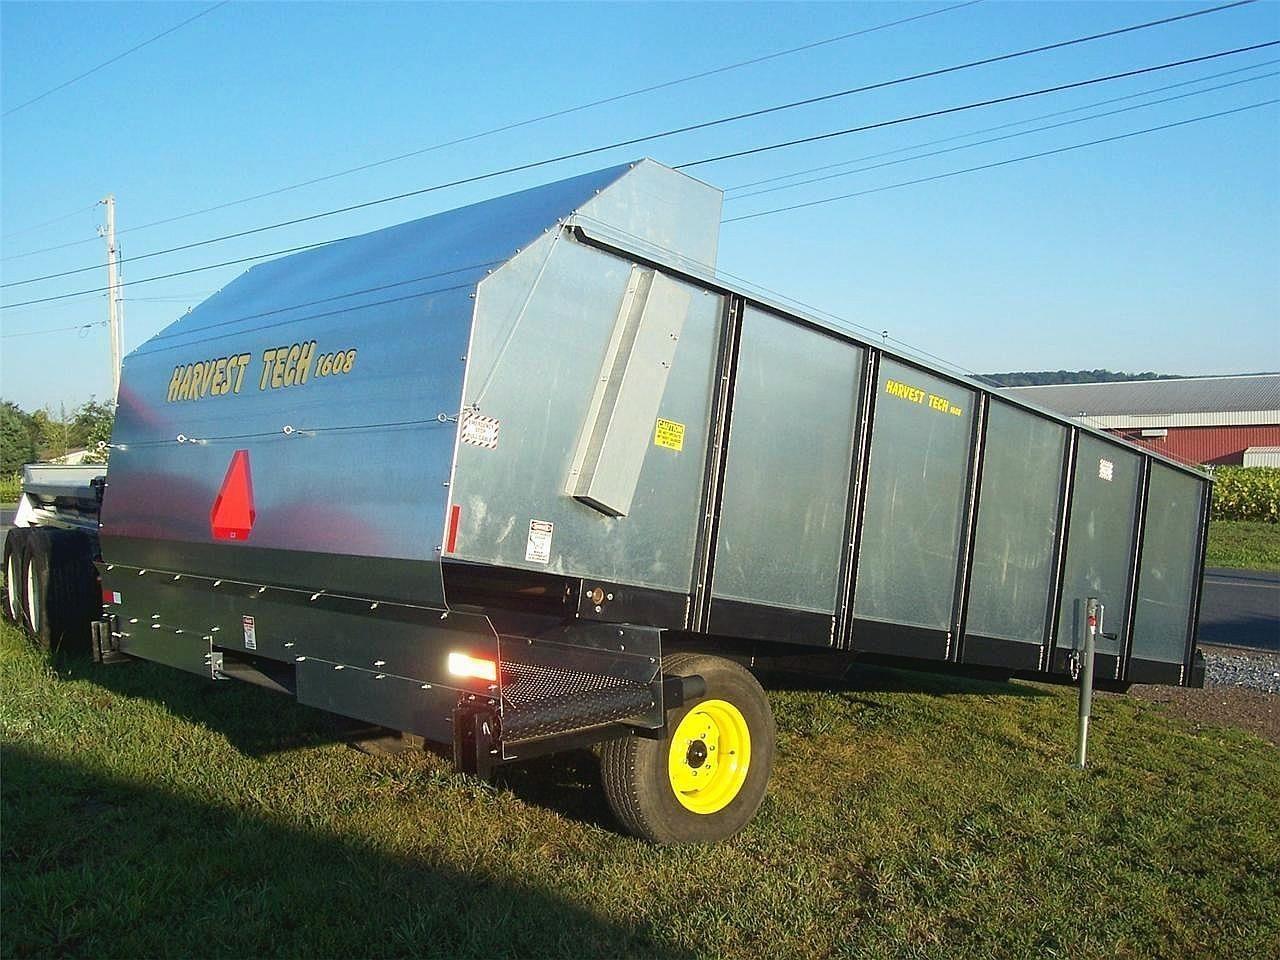 2020 Harvest Tech 1611 Feed Wagon